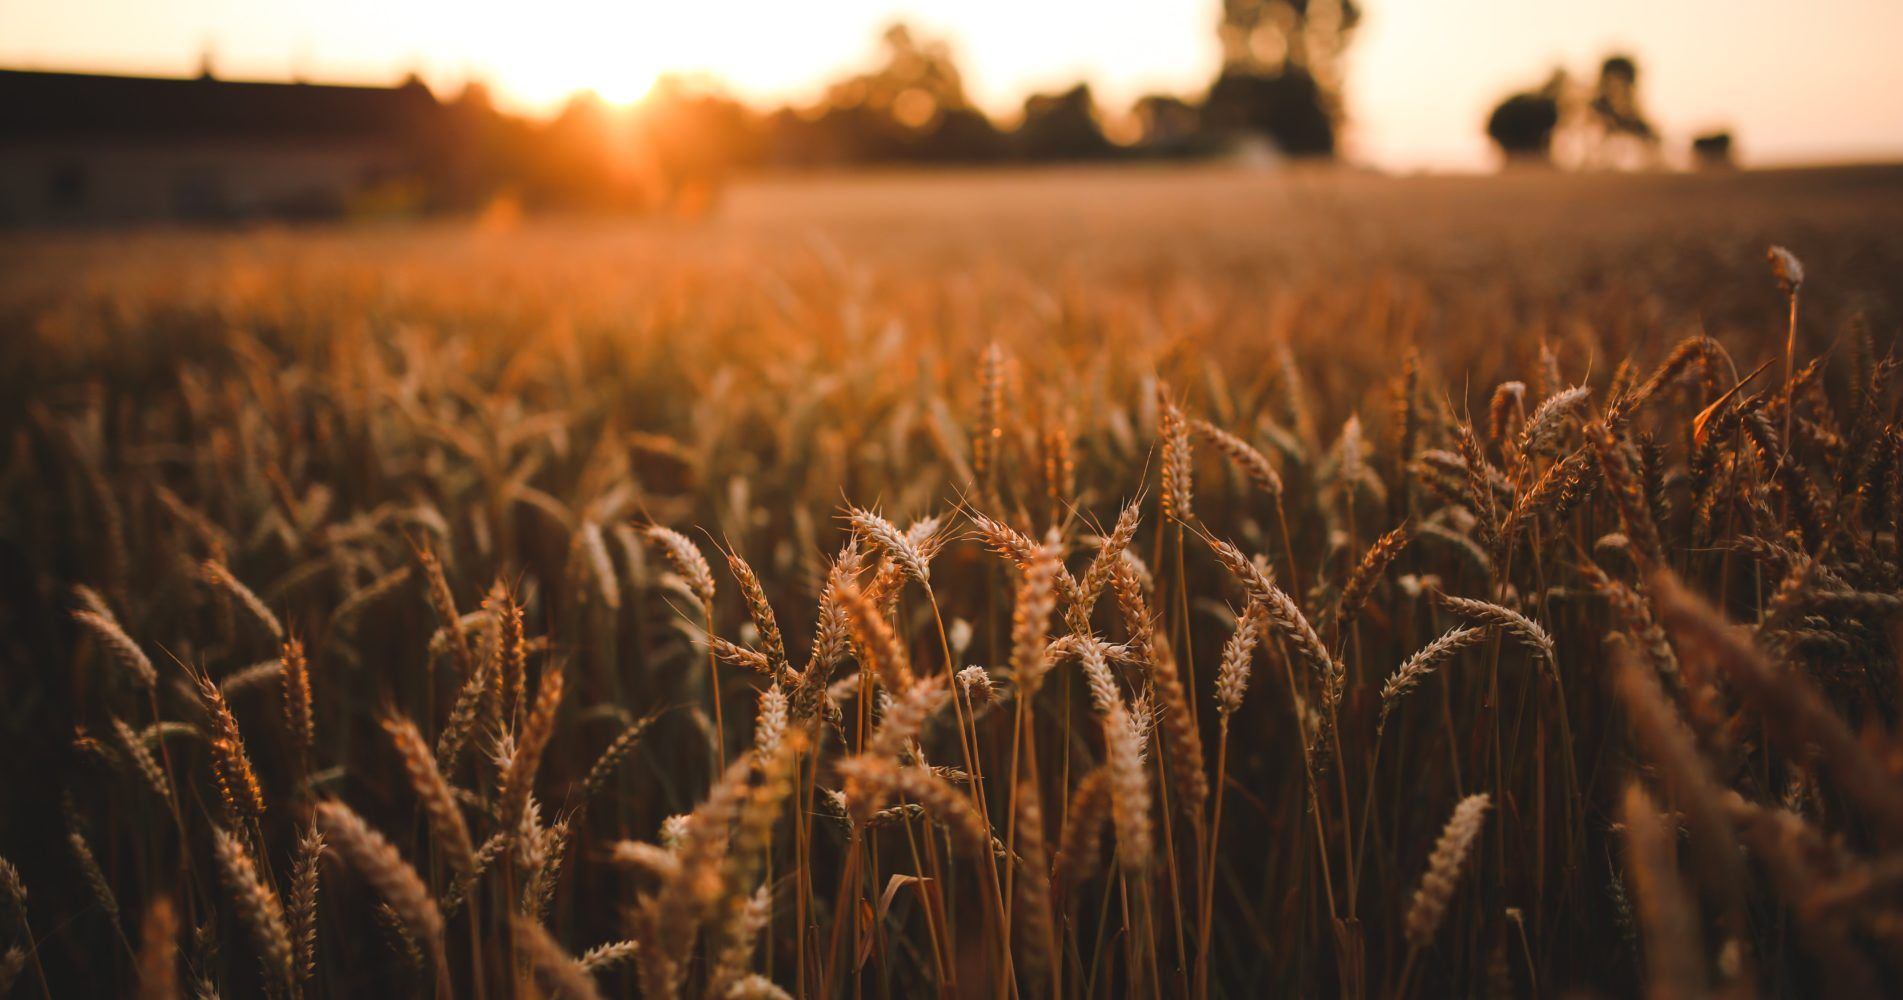 field-grain-harvest-5980